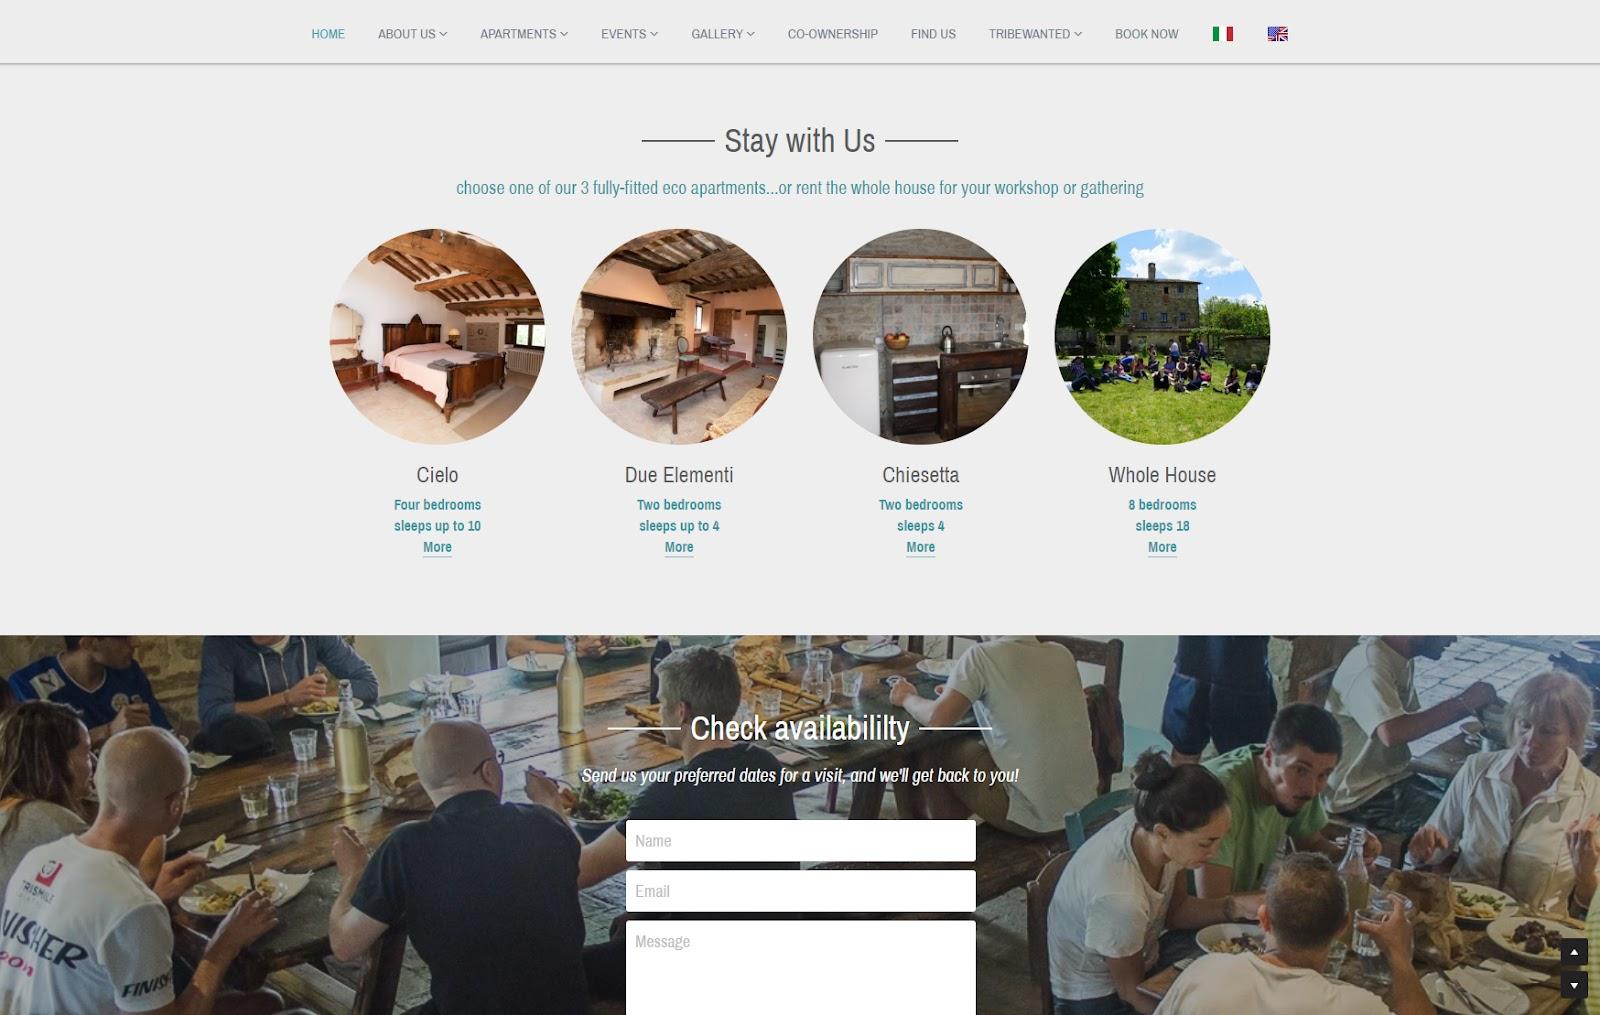 Tribewanted homepage